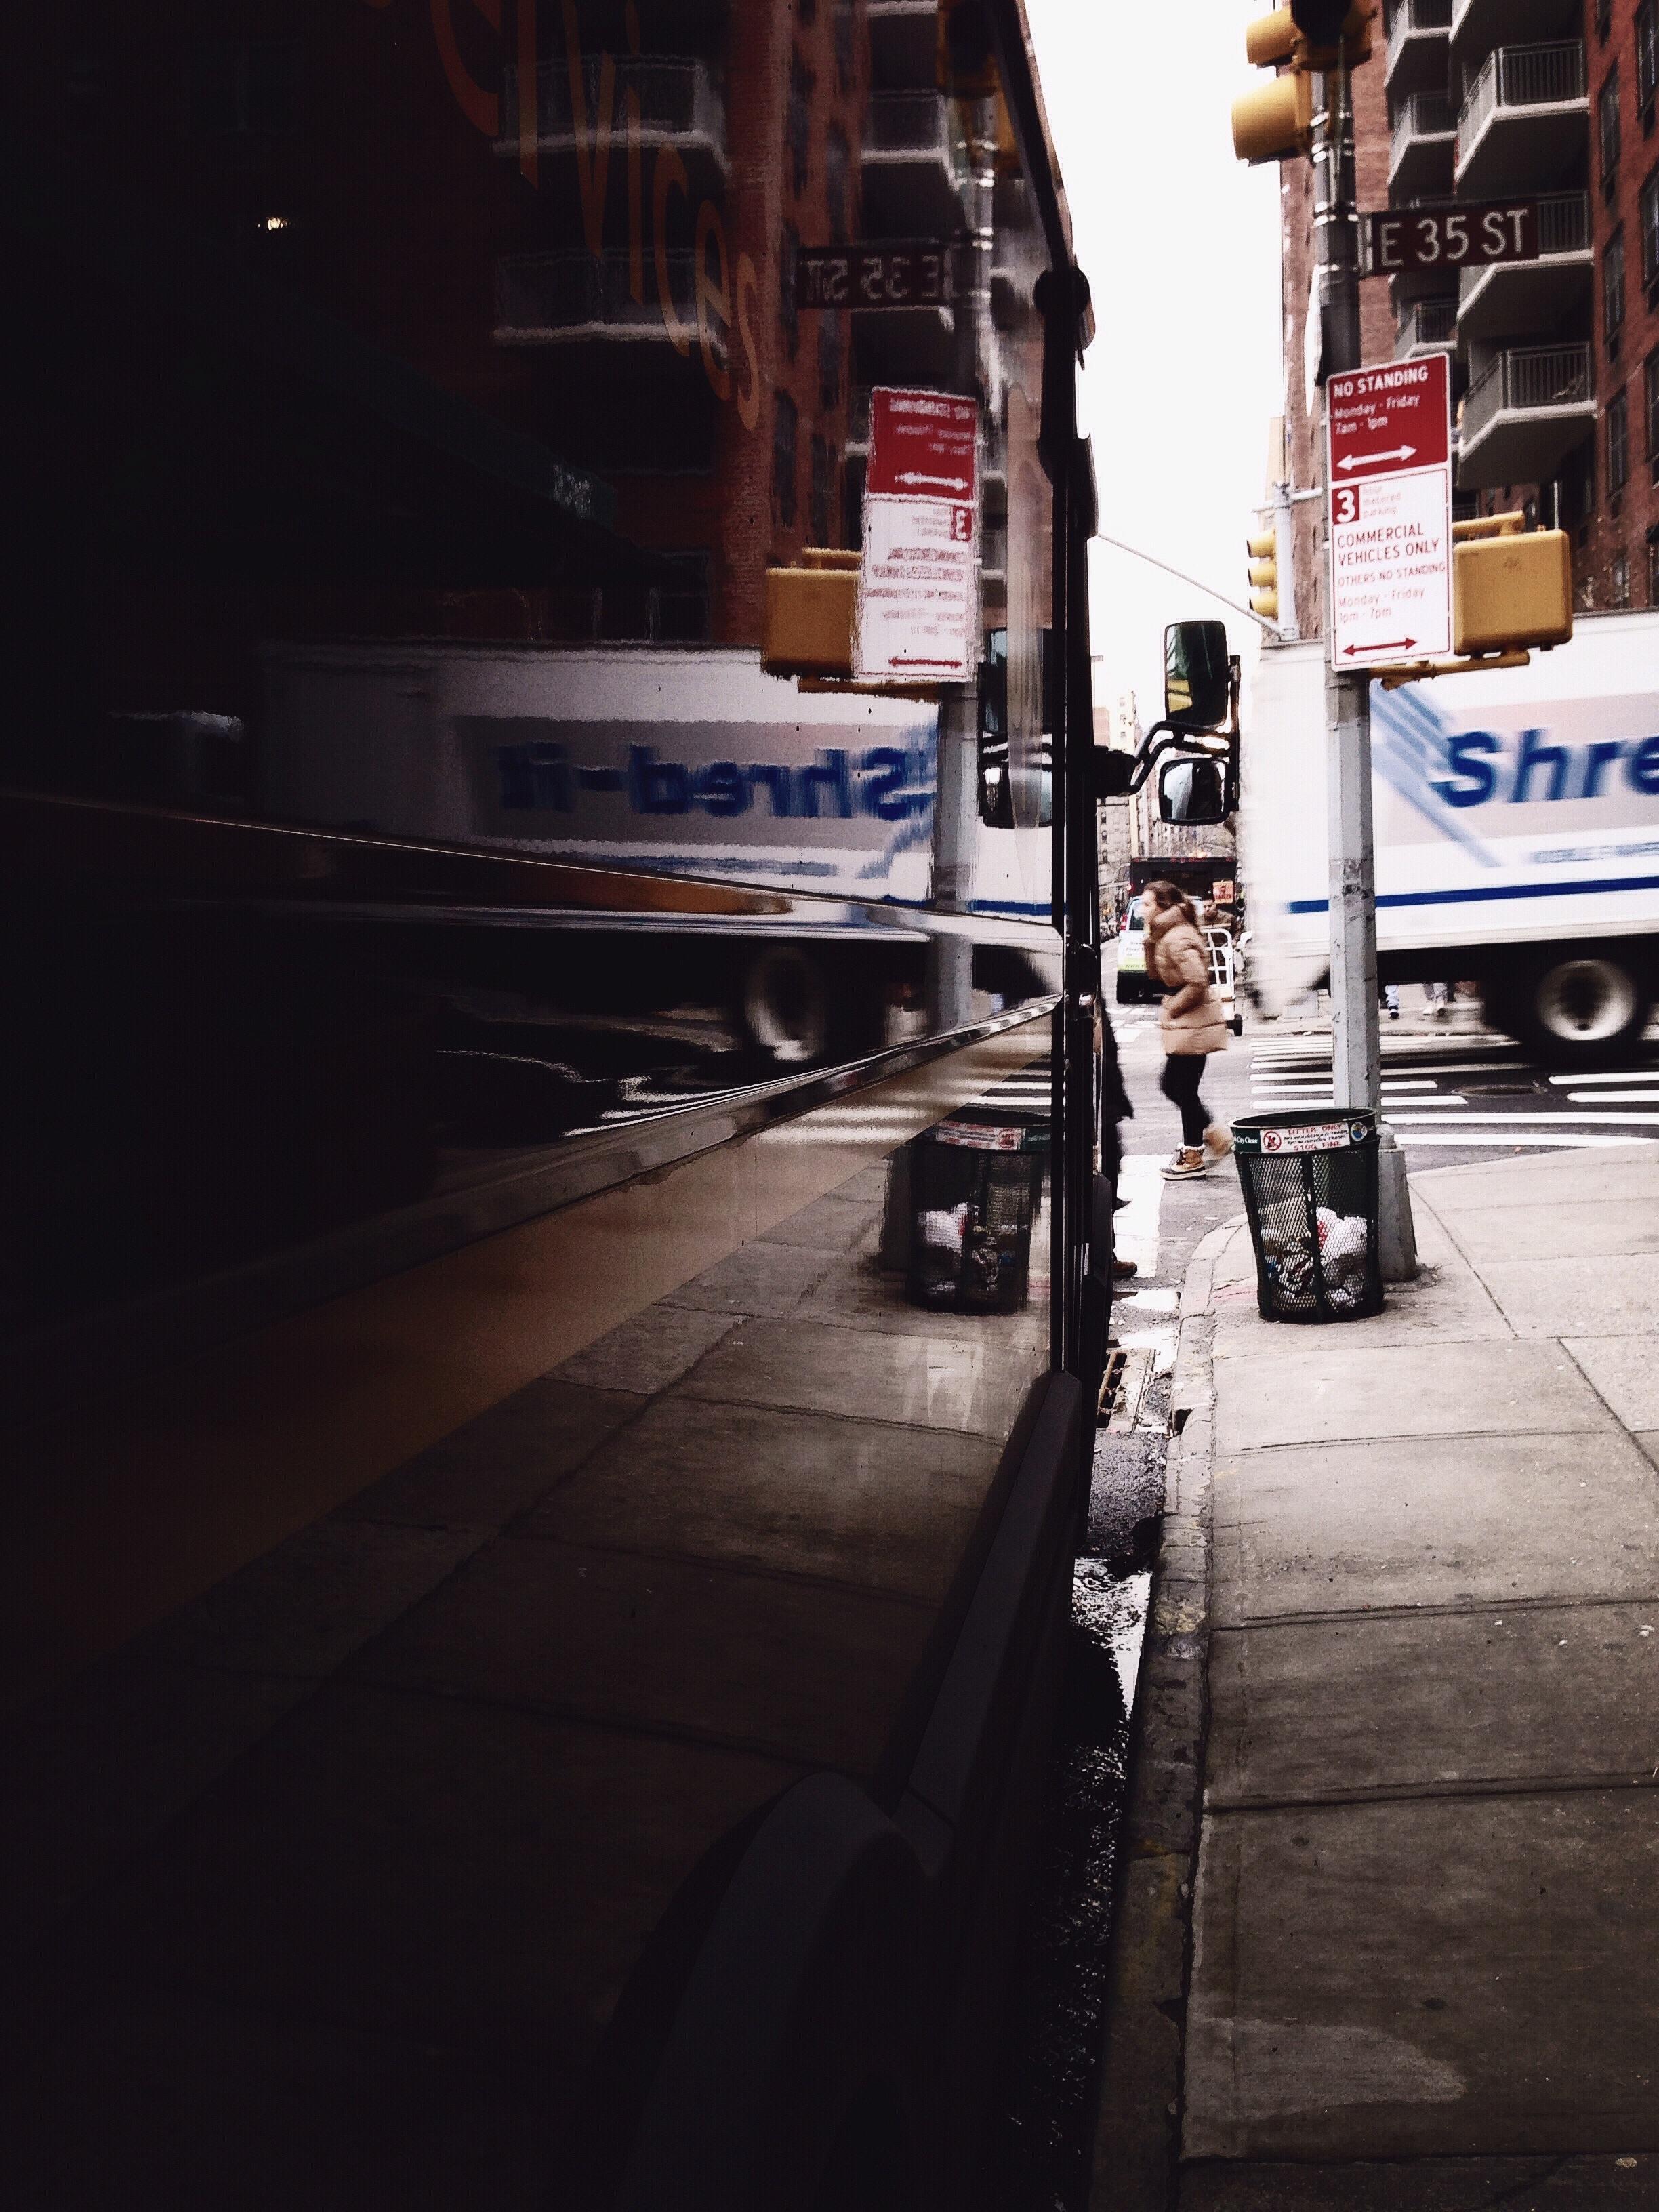 photographer: Evan Rummel, Mopho.to